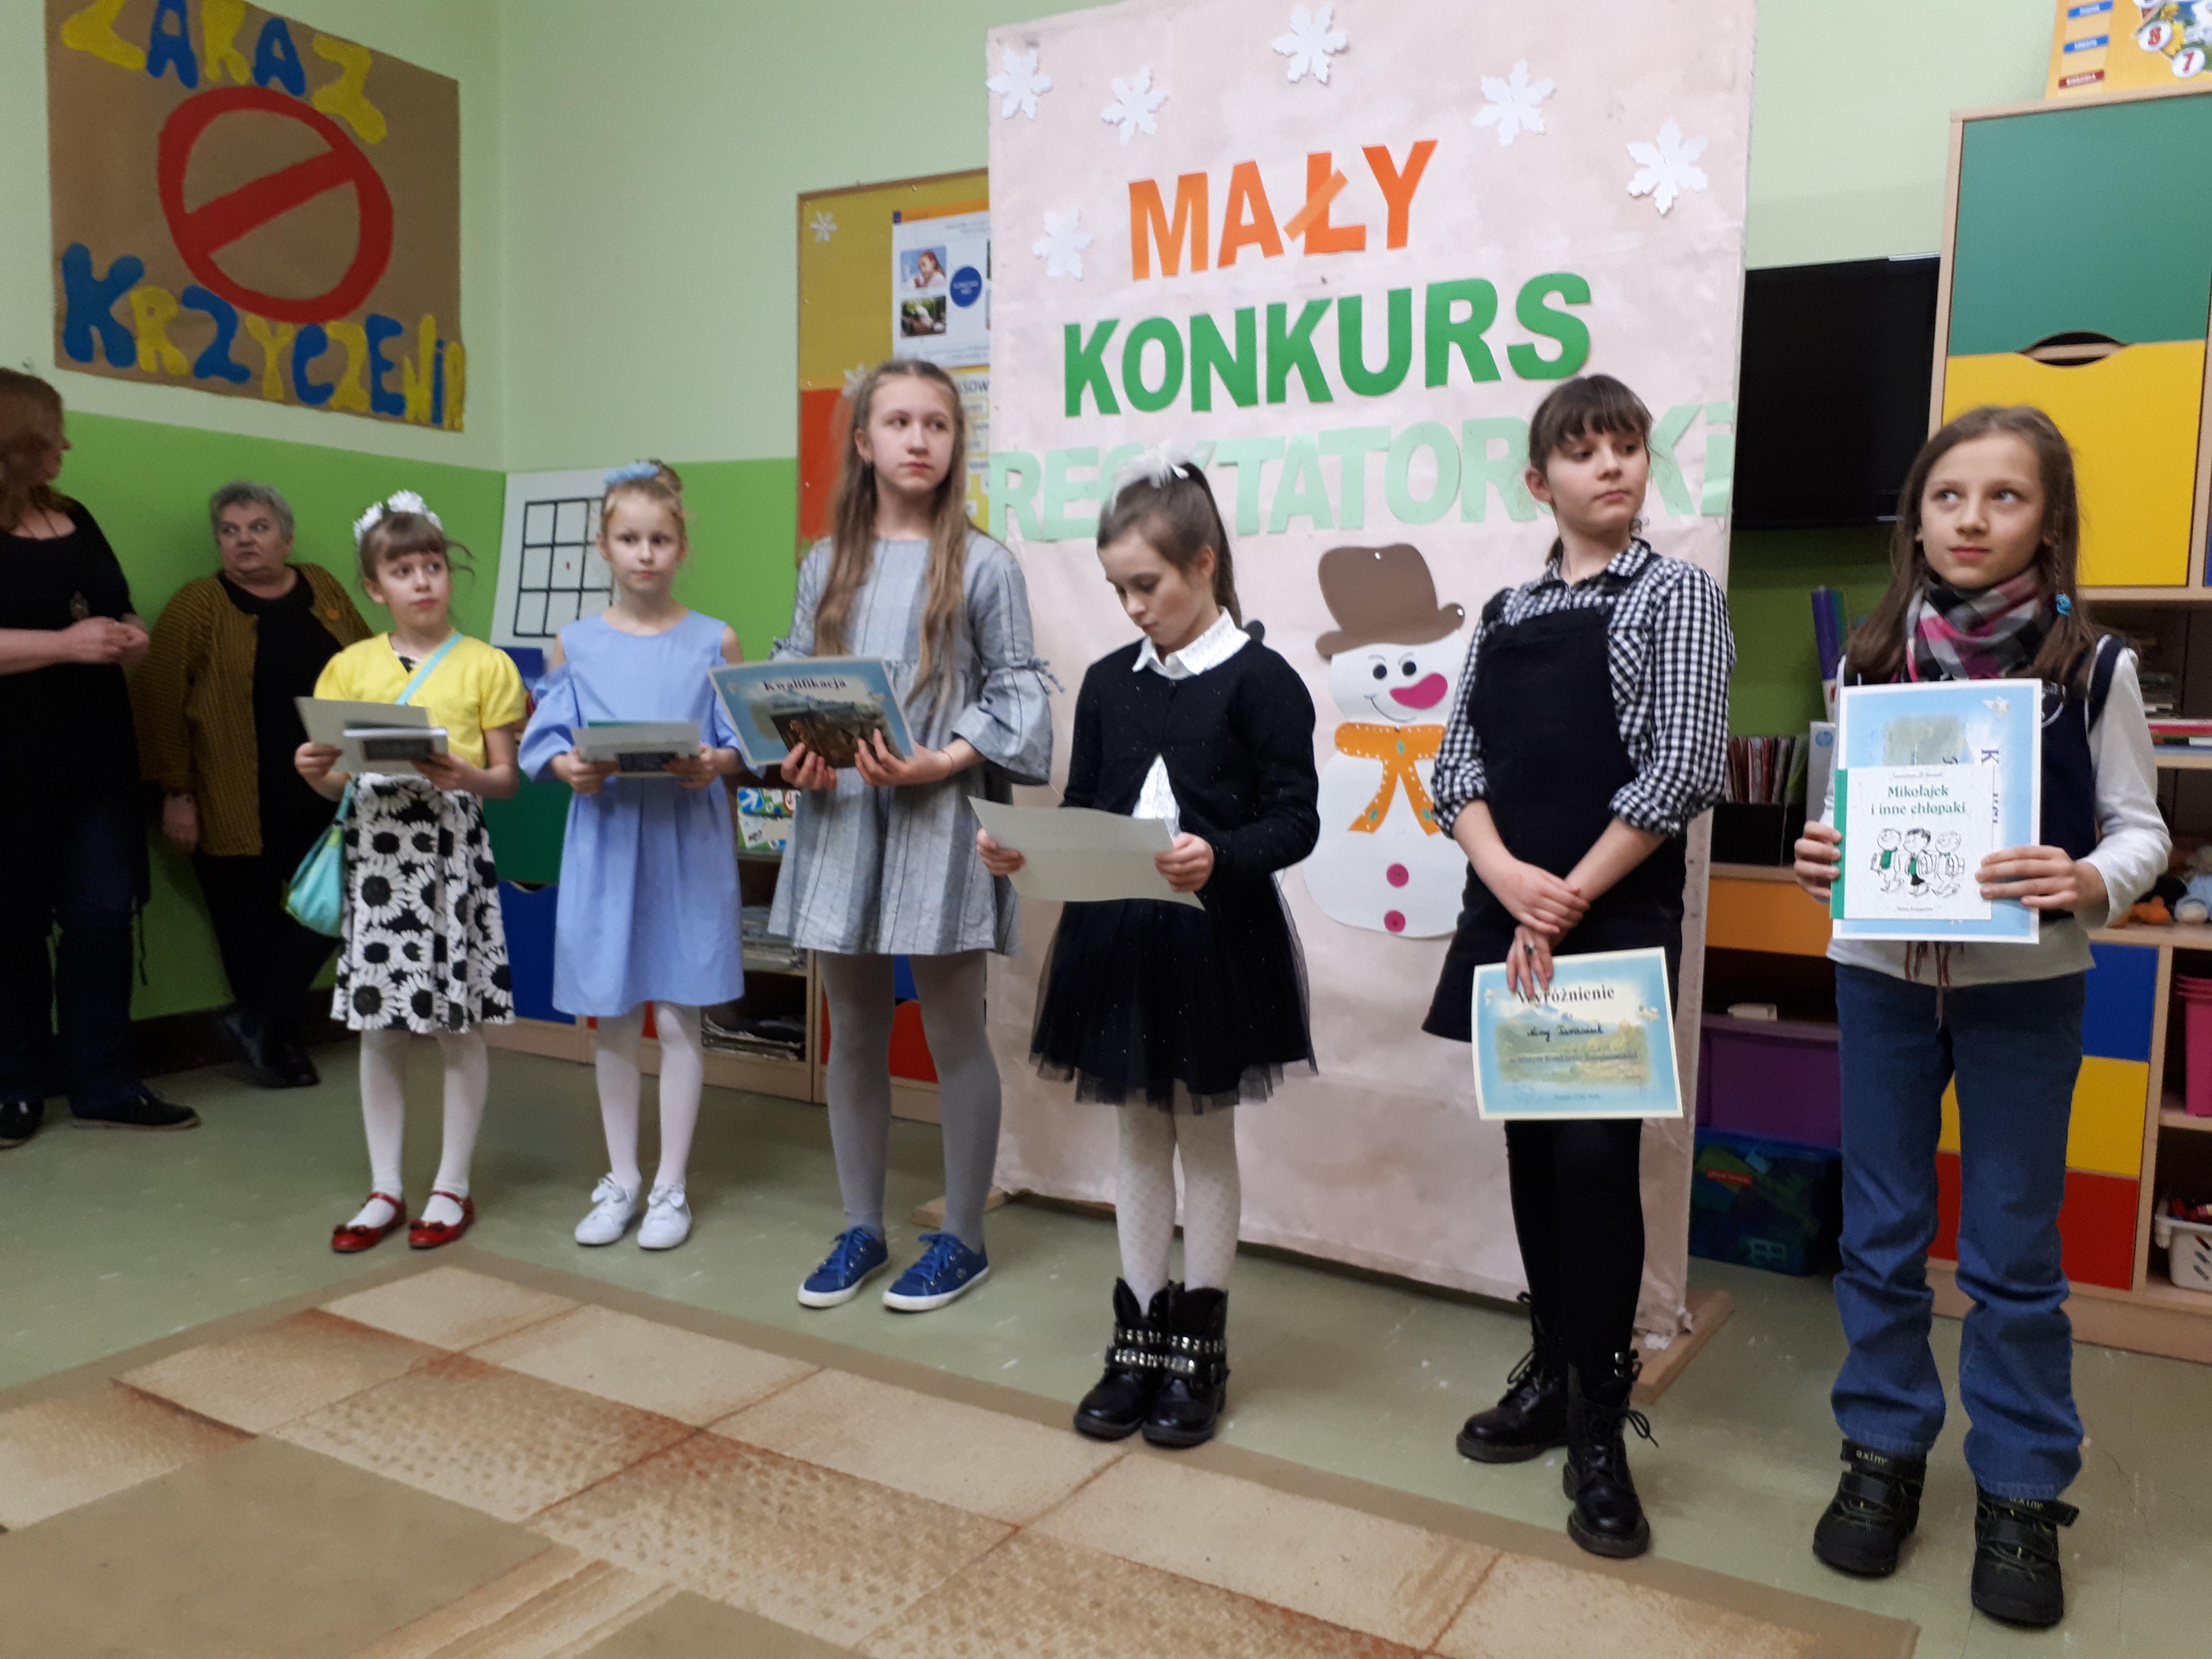 KONKURS RECYTATORSKI - 5